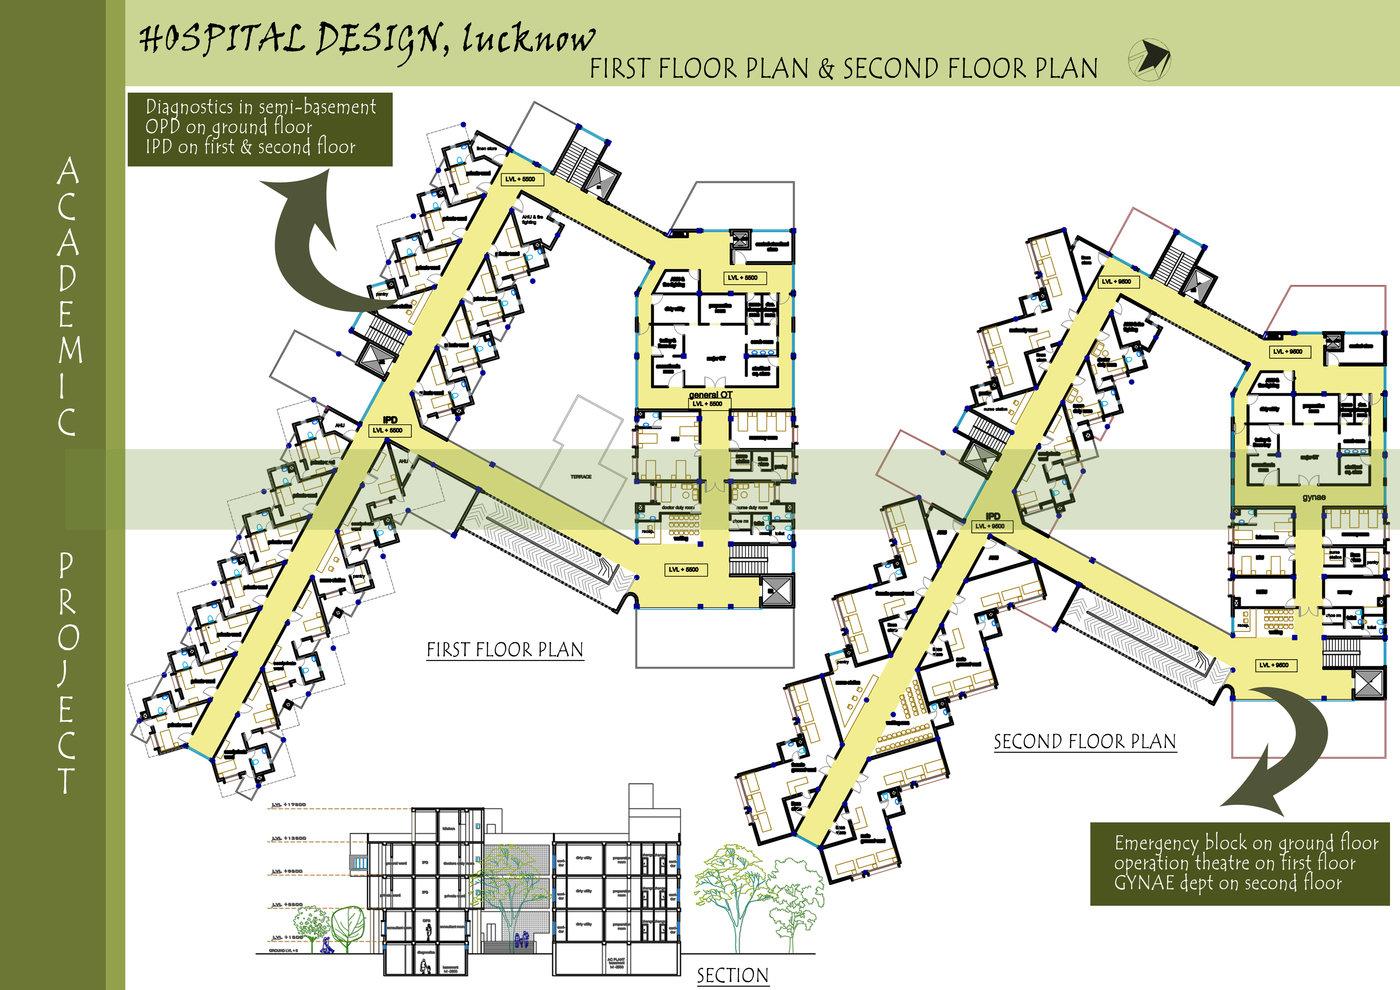 Hospital design by Ruchi Yadav at Coroflot com